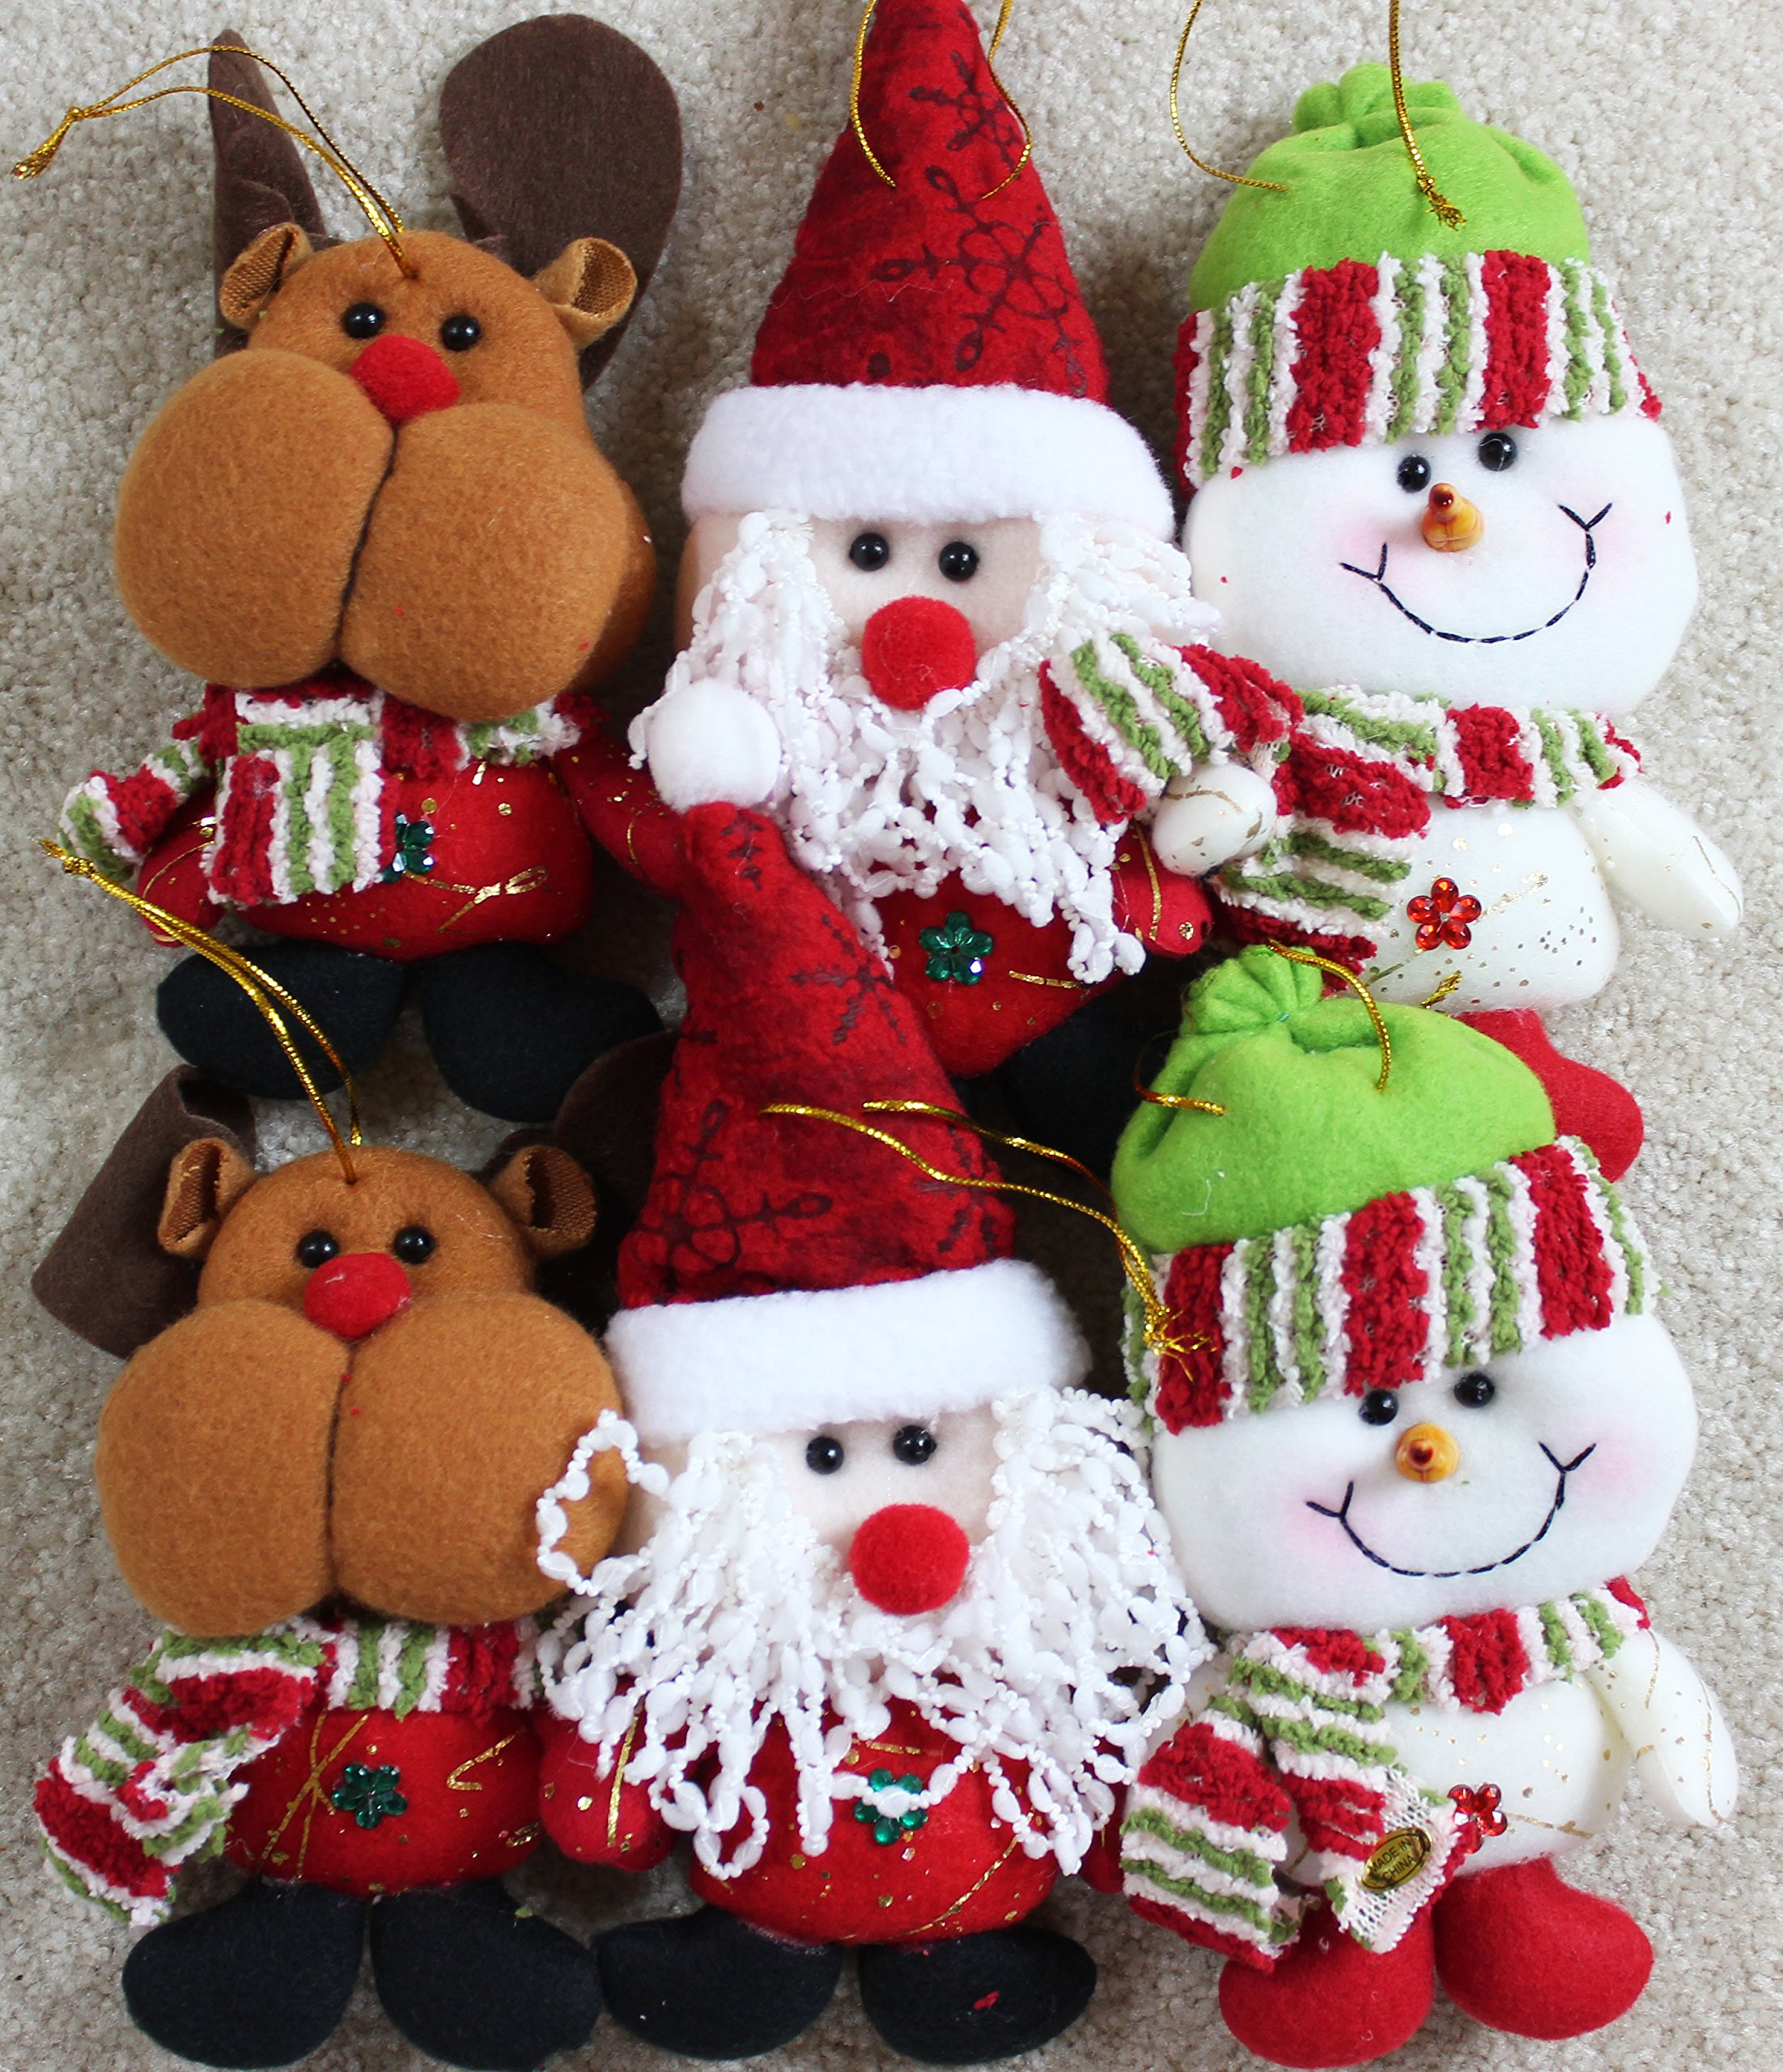 6pk-Plush-Christmas-Ornament-Sets-santasnowmanreindeer